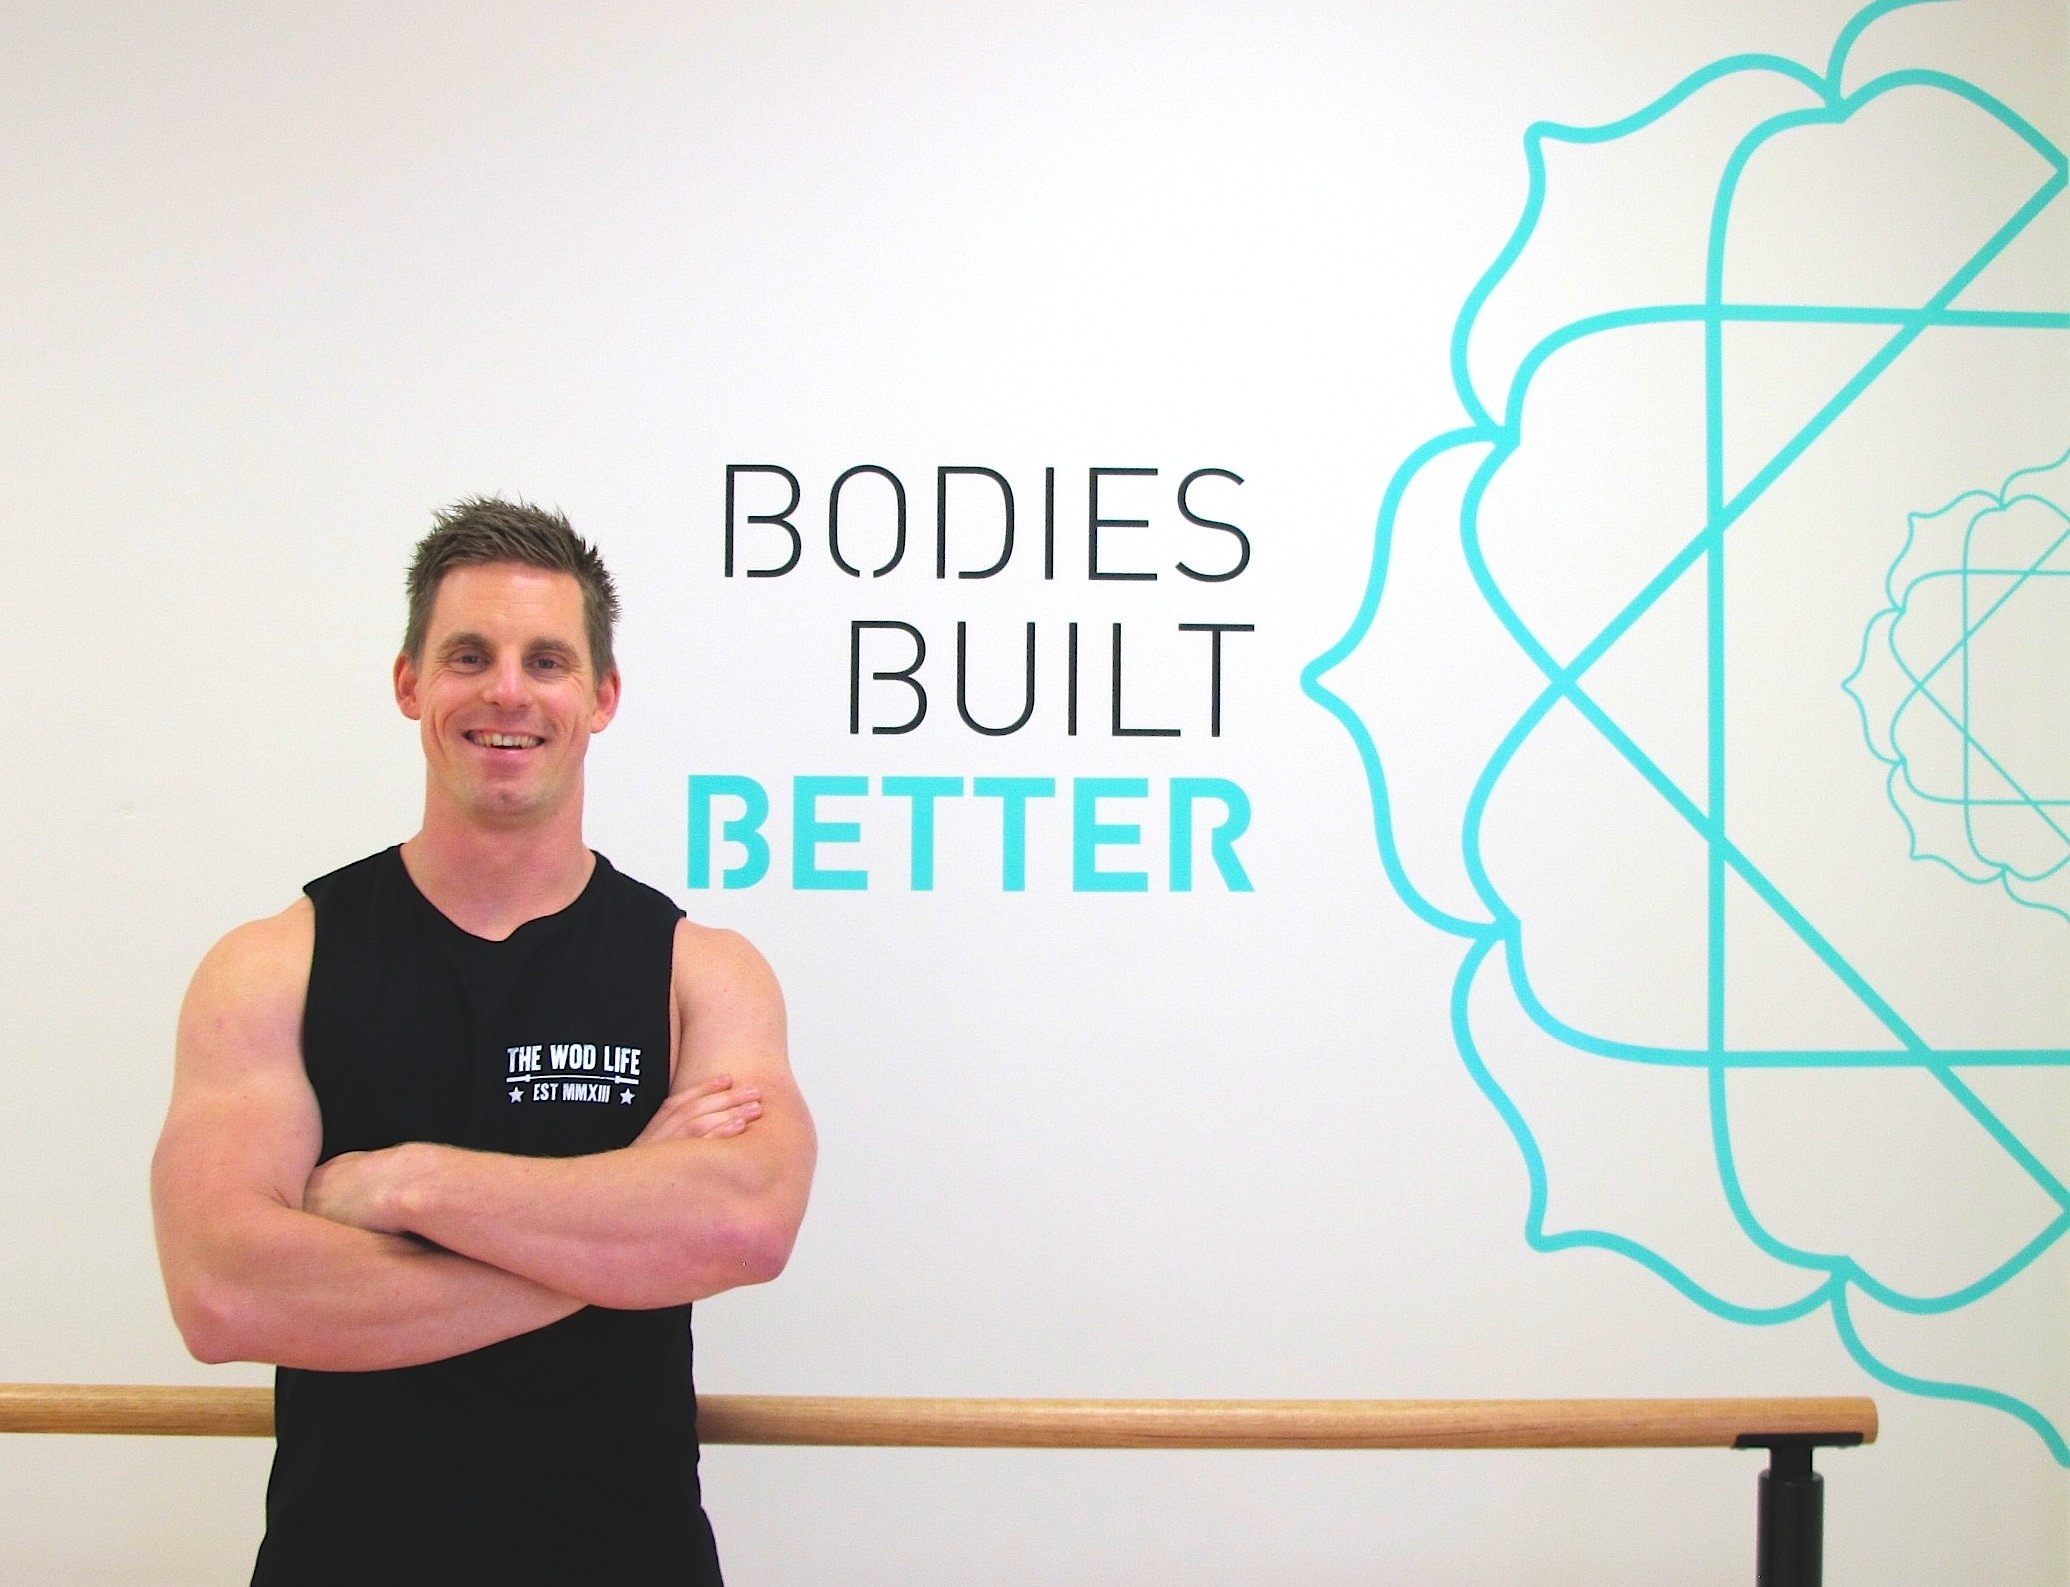 bodies build better